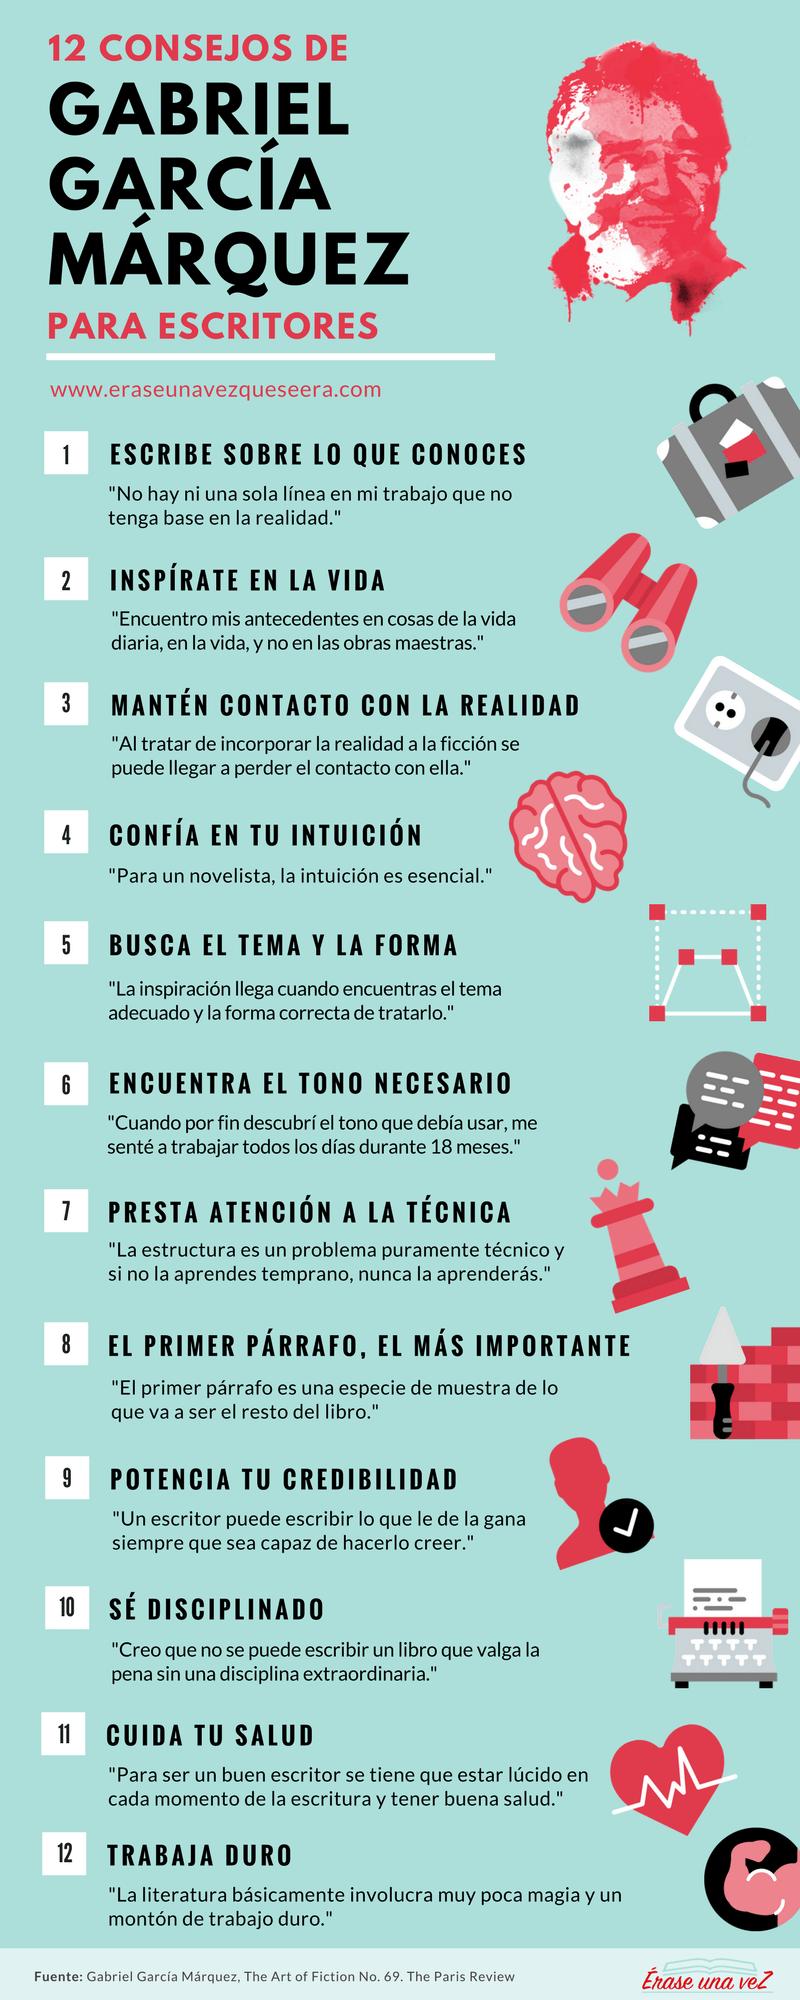 12 consejos de García Márquez para escritores #infografia ...